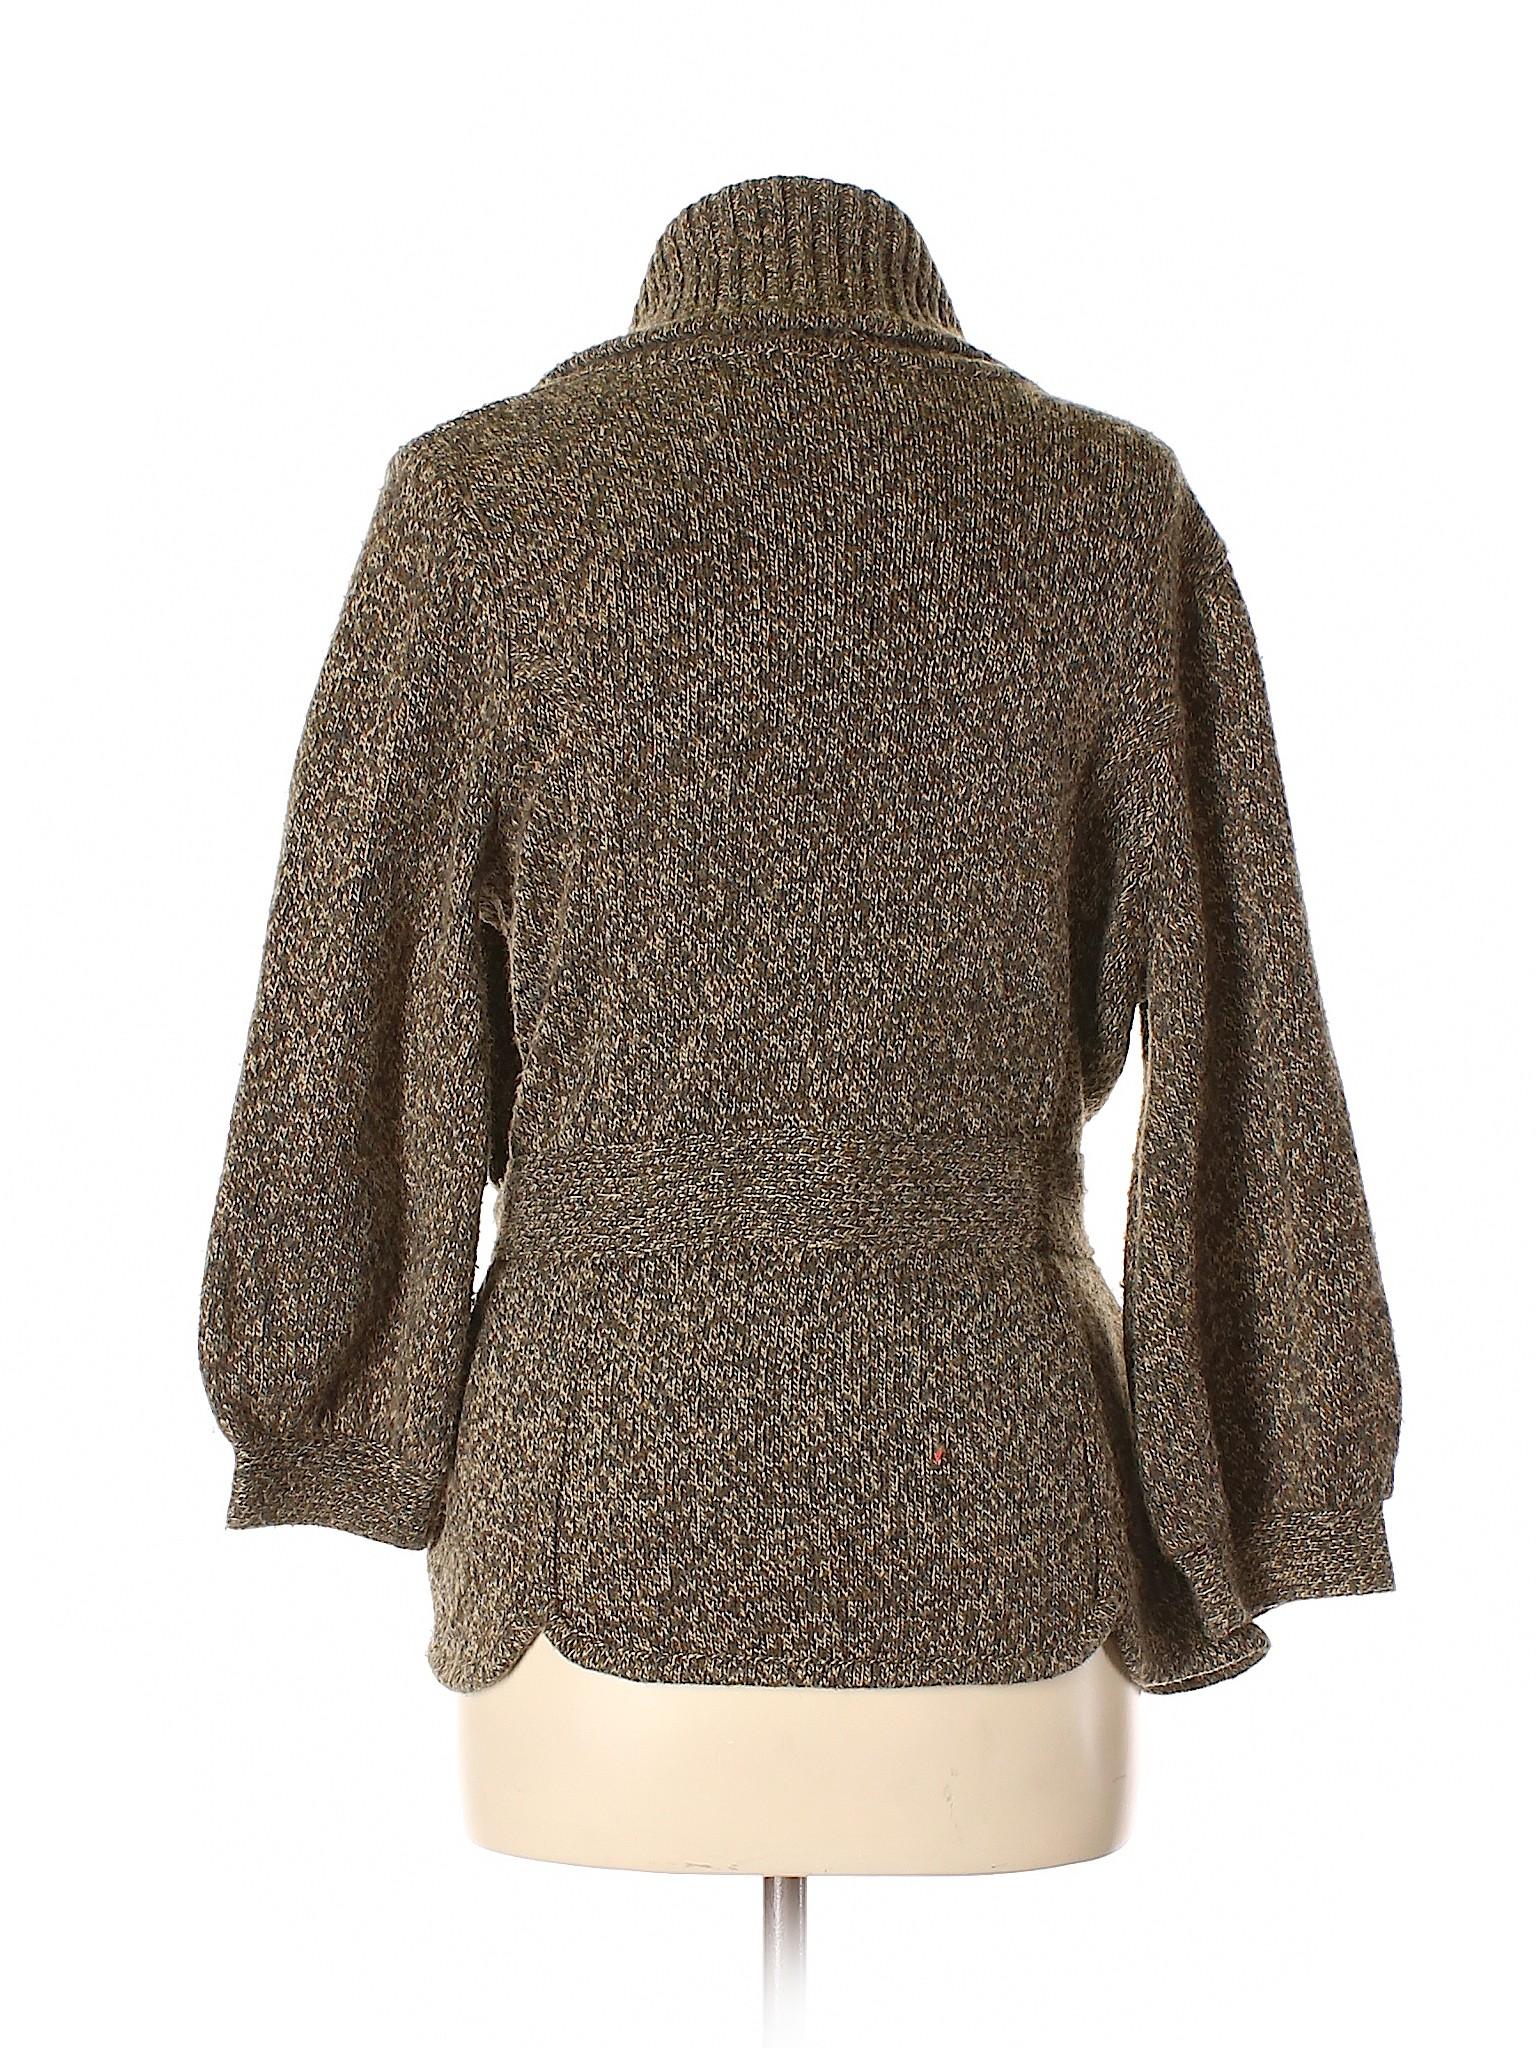 Cardigan Boutique Concepts INC winter International qPwIZYP